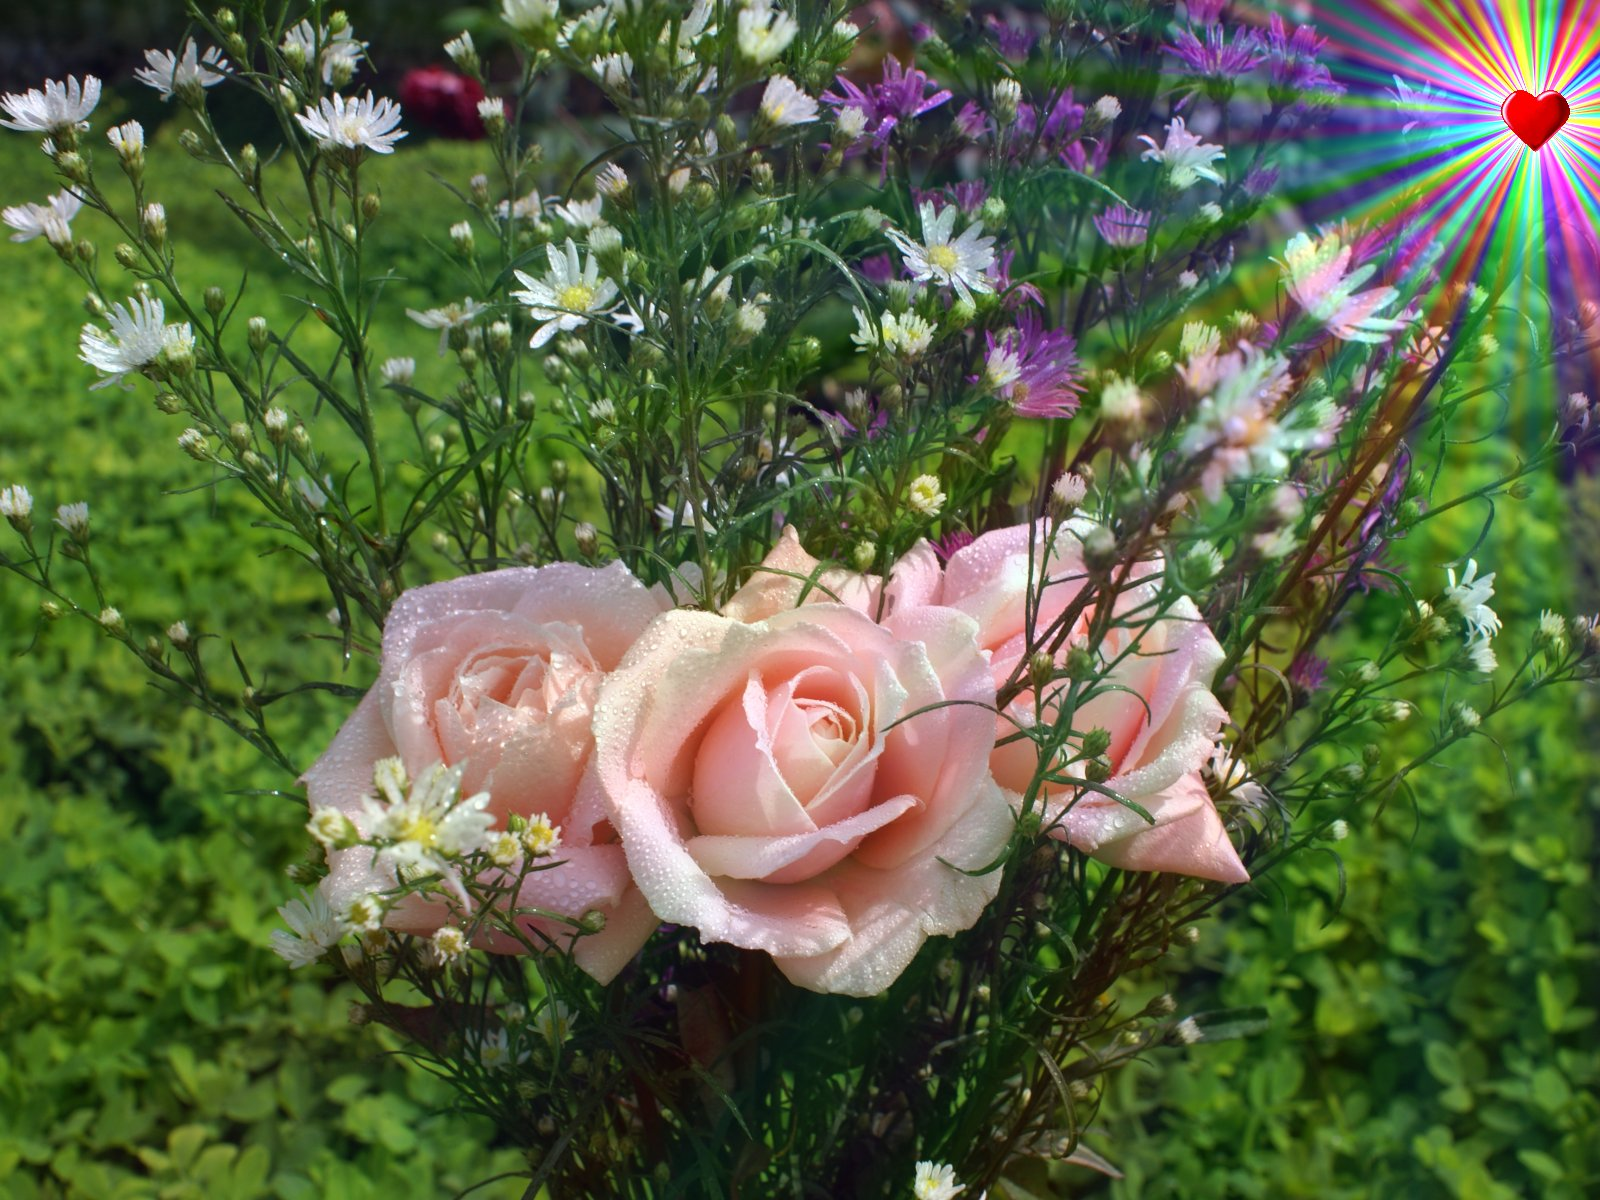 http://3.bp.blogspot.com/-nXc5RUOAjvo/TmiWmdynubI/AAAAAAAAILM/hLV80PgkVzQ/s1600/love_roses-dsc00344-a1.jpg